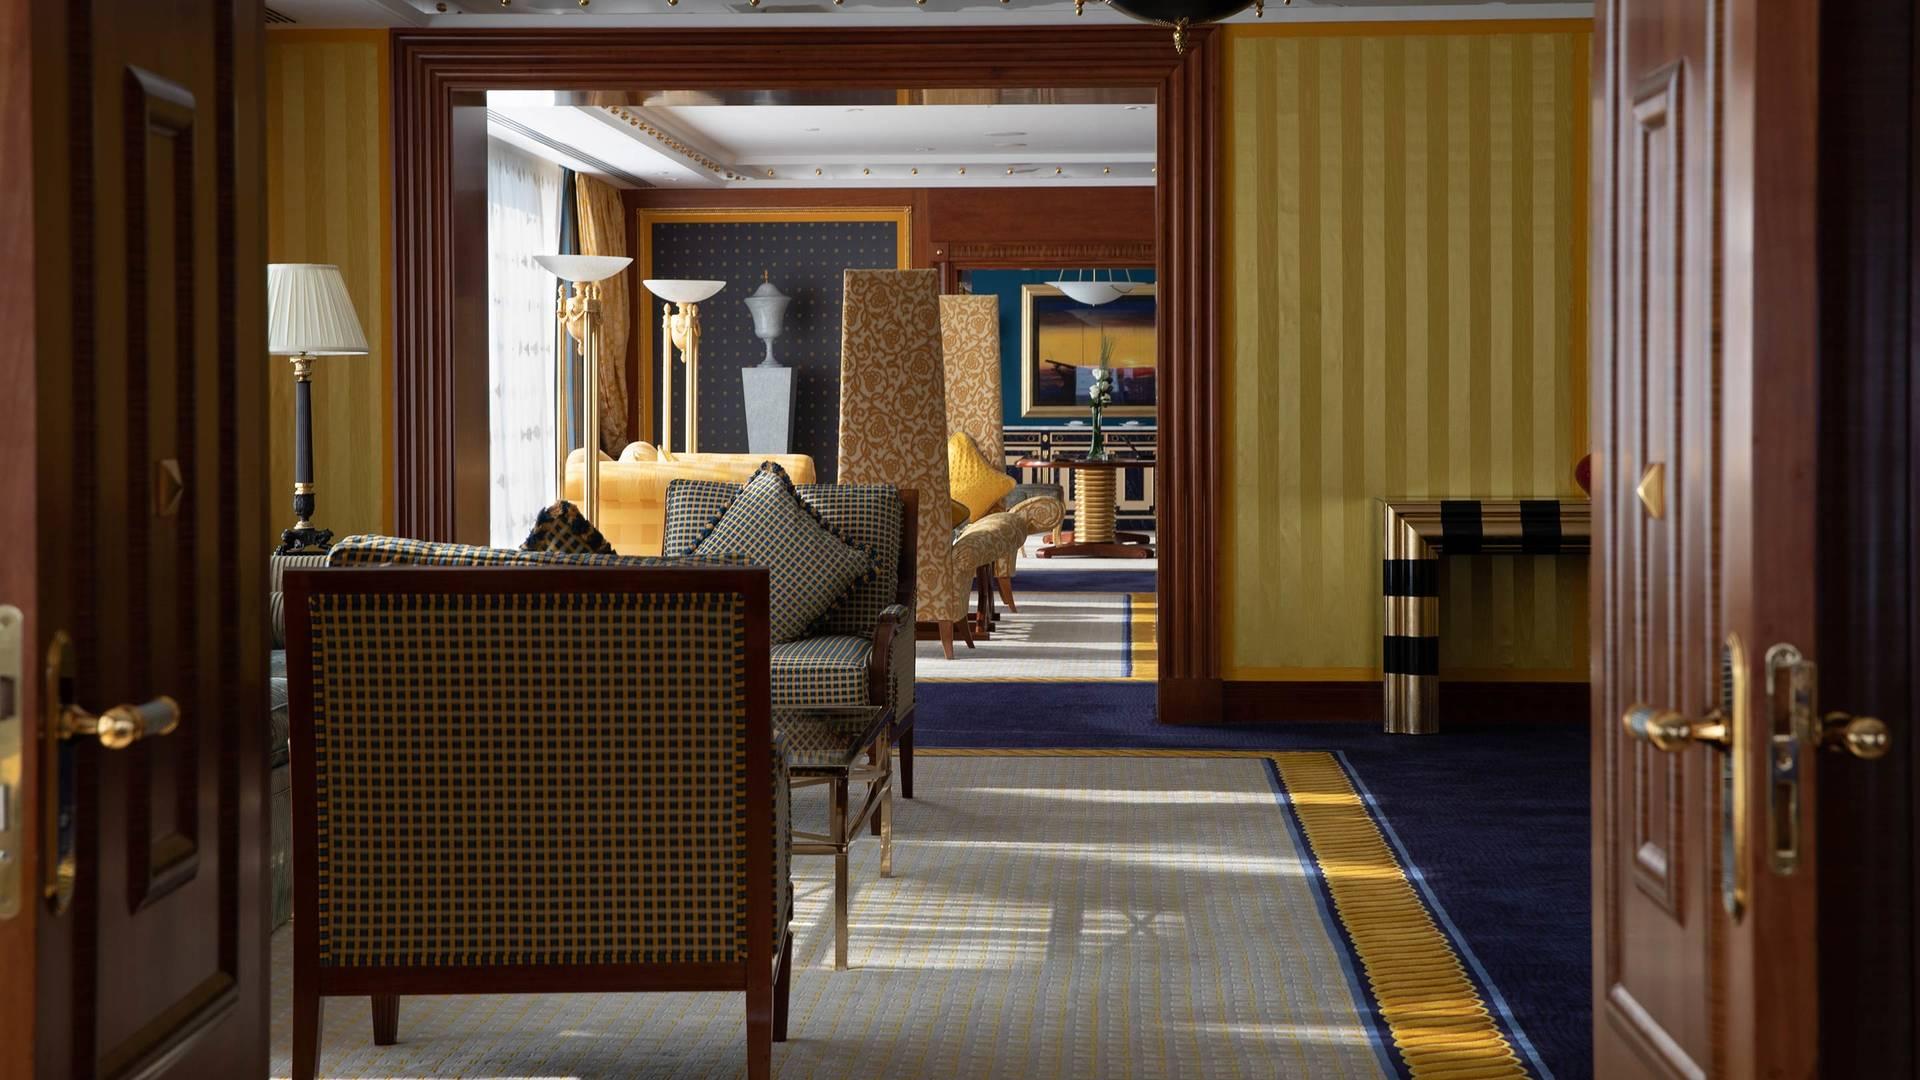 Jumeirah Burj Al Arab Presidential suite living room 2_16-9